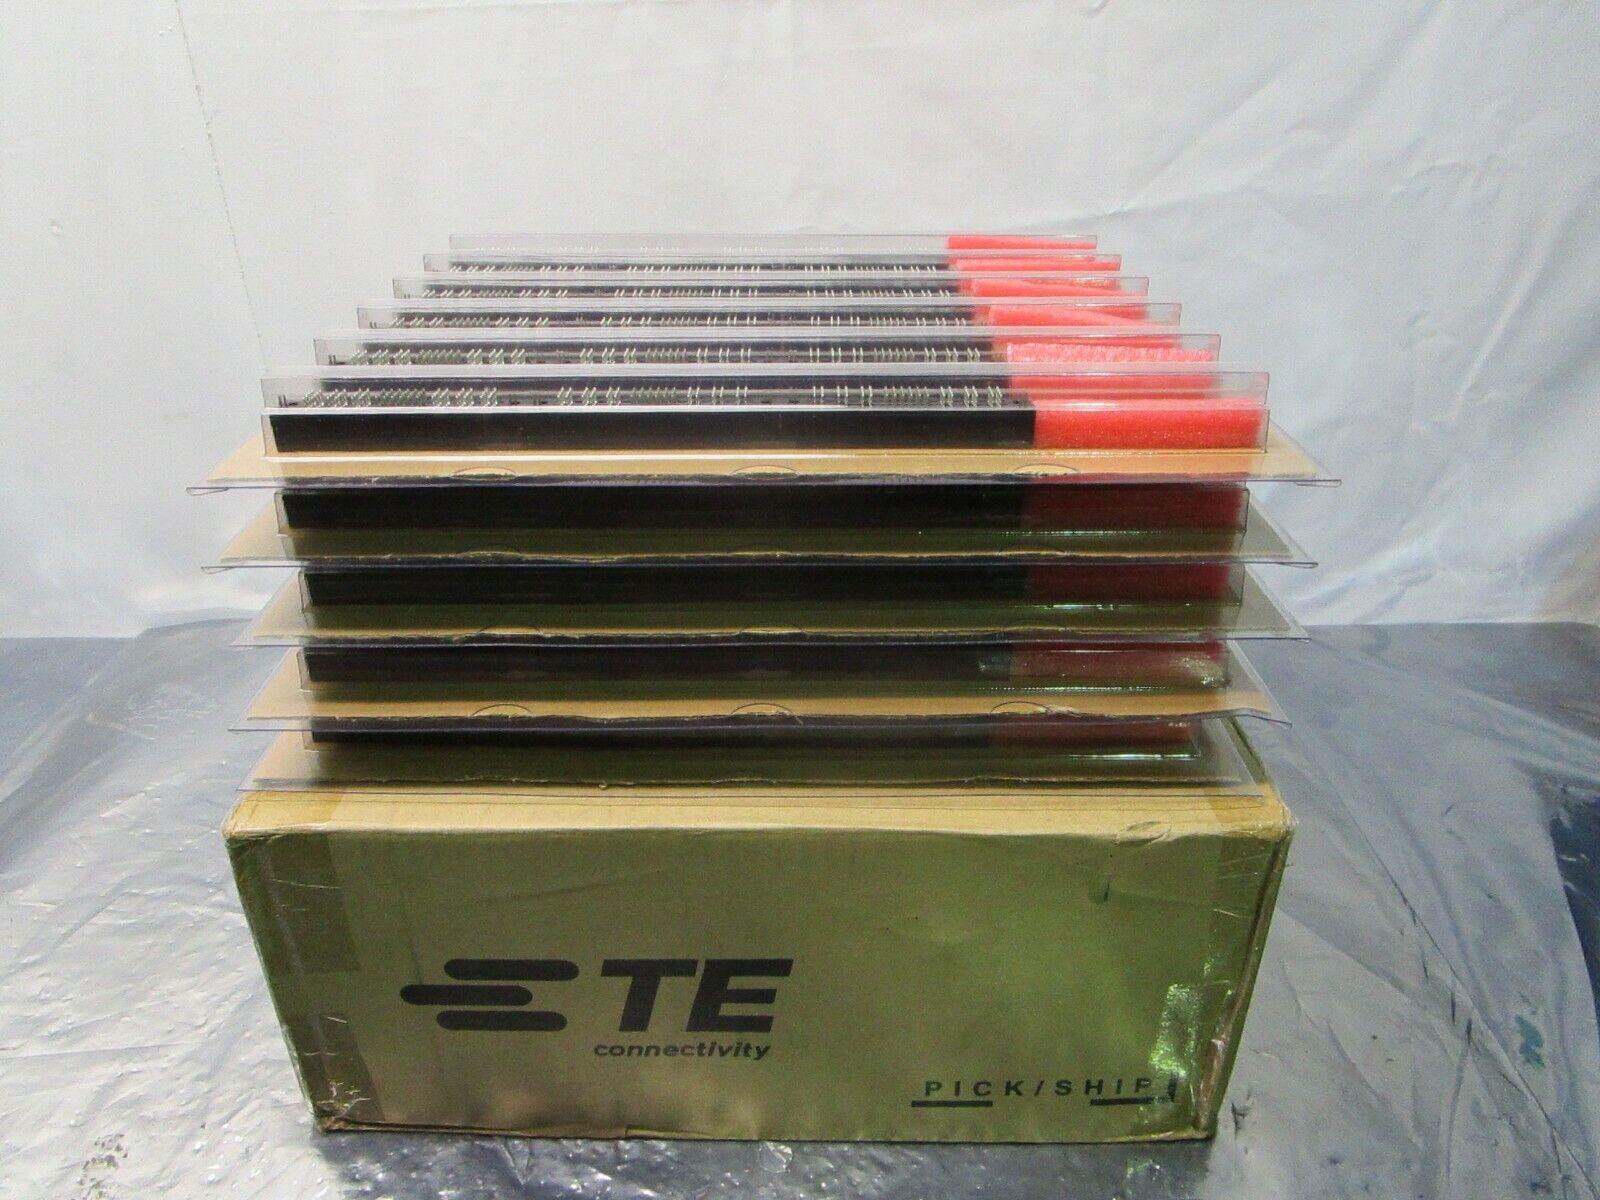 1 Lot of 90 TE connectivity 3-6600333-9 Power-Board MBXL VERT 3P+24S+3P, 101932